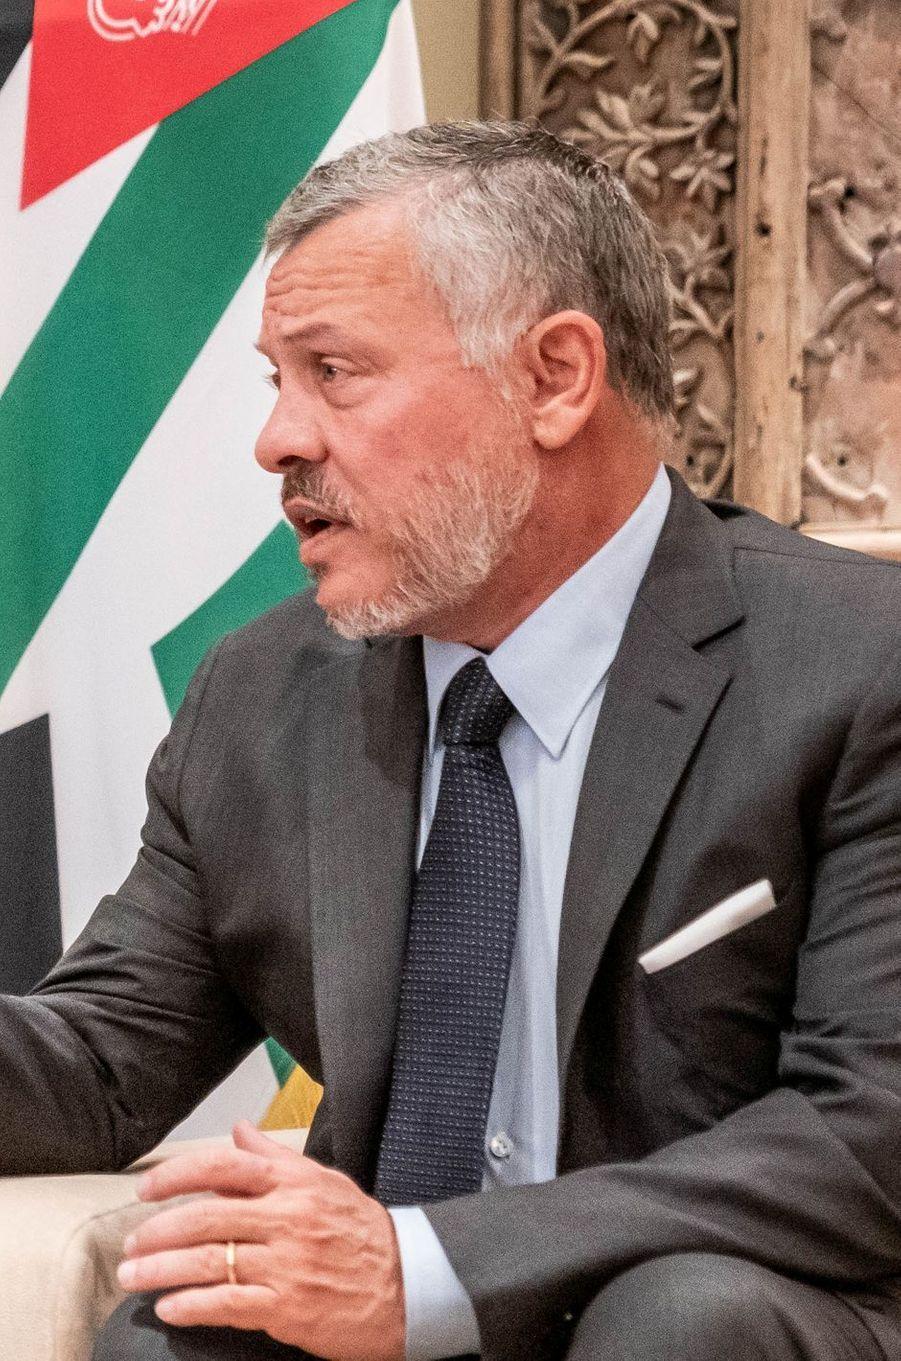 Le roi Abdallah II de Jordanie, le 19 août 2019